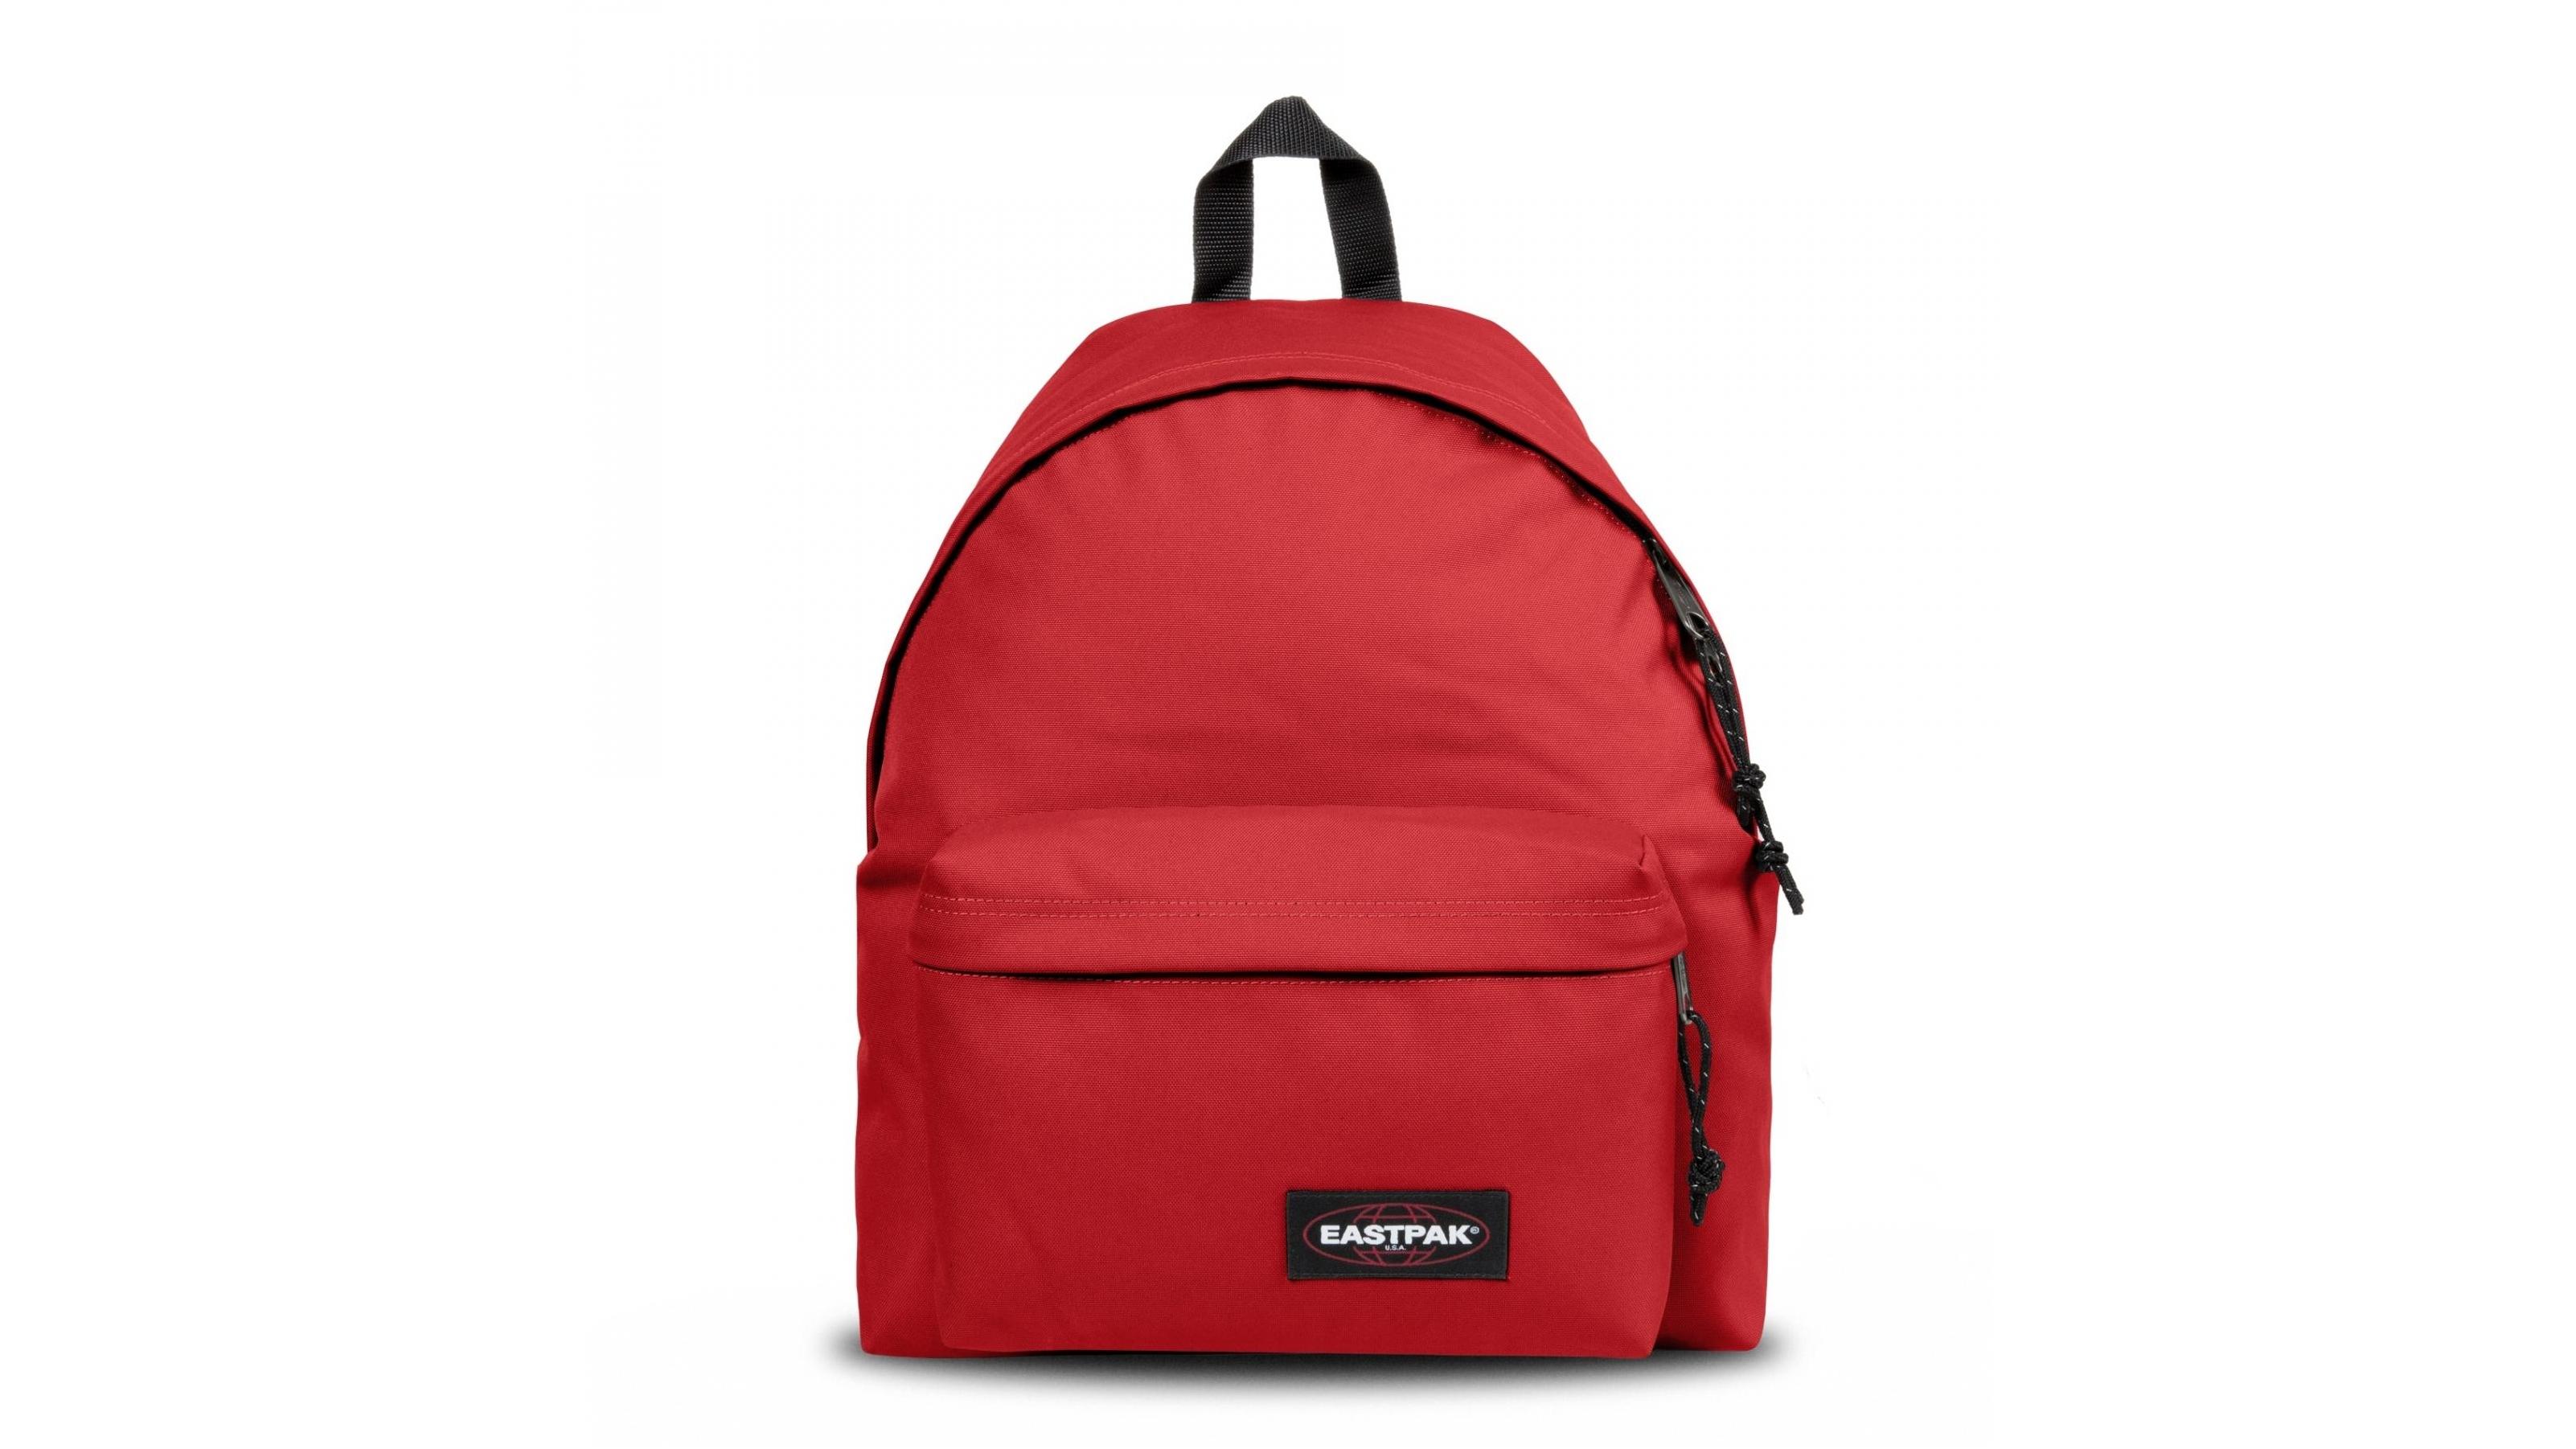 fb364d5e5c Buy Eastpak Padded Pak'r Laptop Bag - Apple Pick Red | Harvey Norman AU